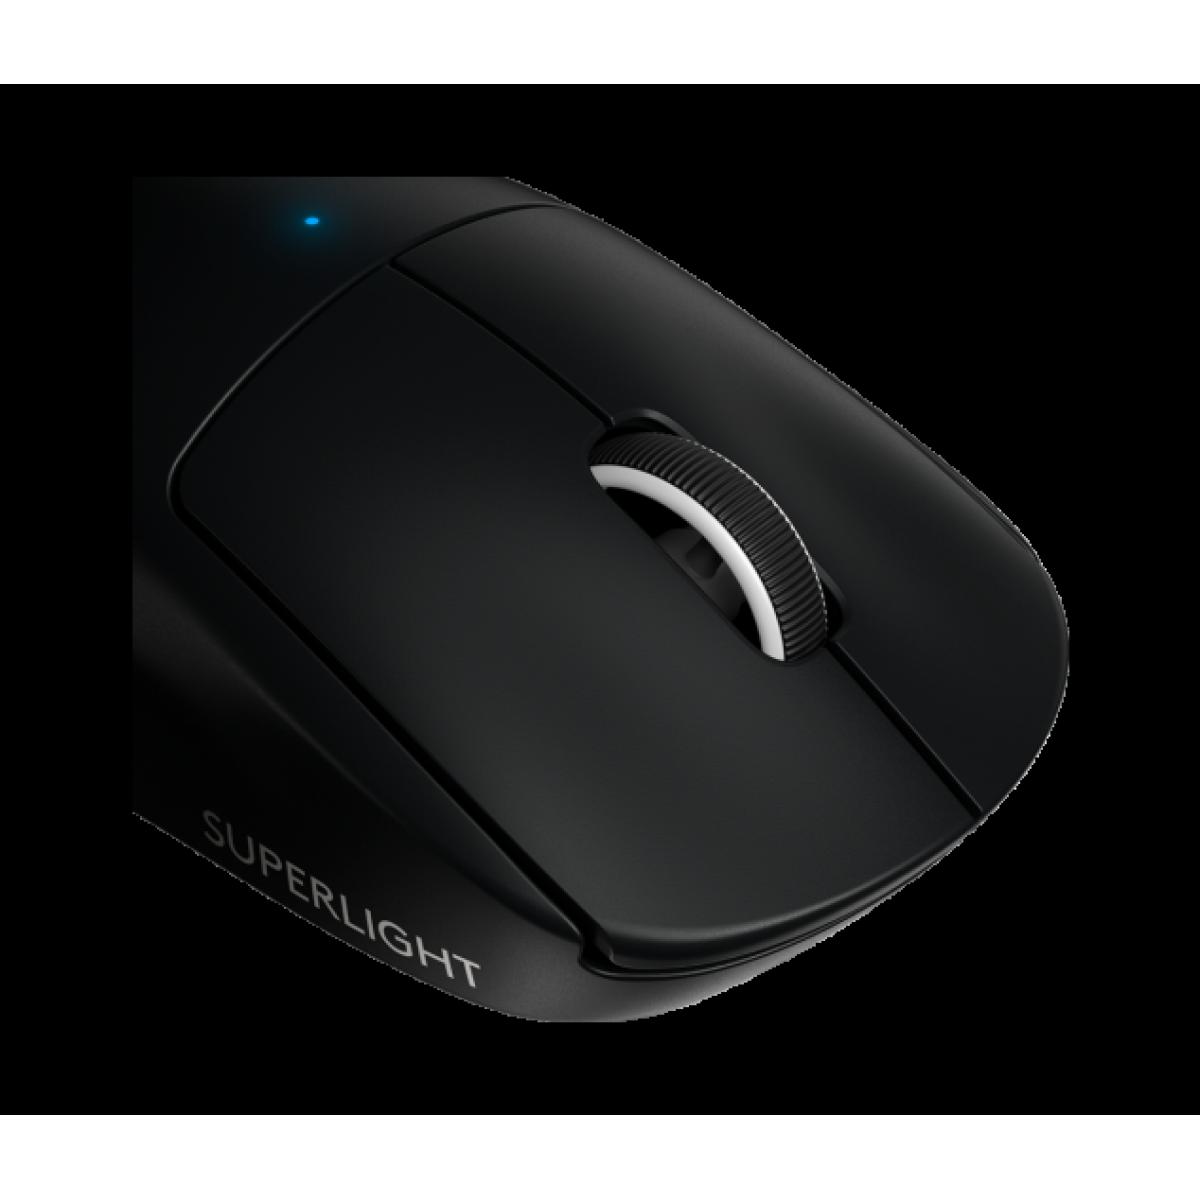 Mouse Gamer Wireless Logitech G Pro X Superlight, 25.400 DPI, 6 Botões, Black, 910-005879